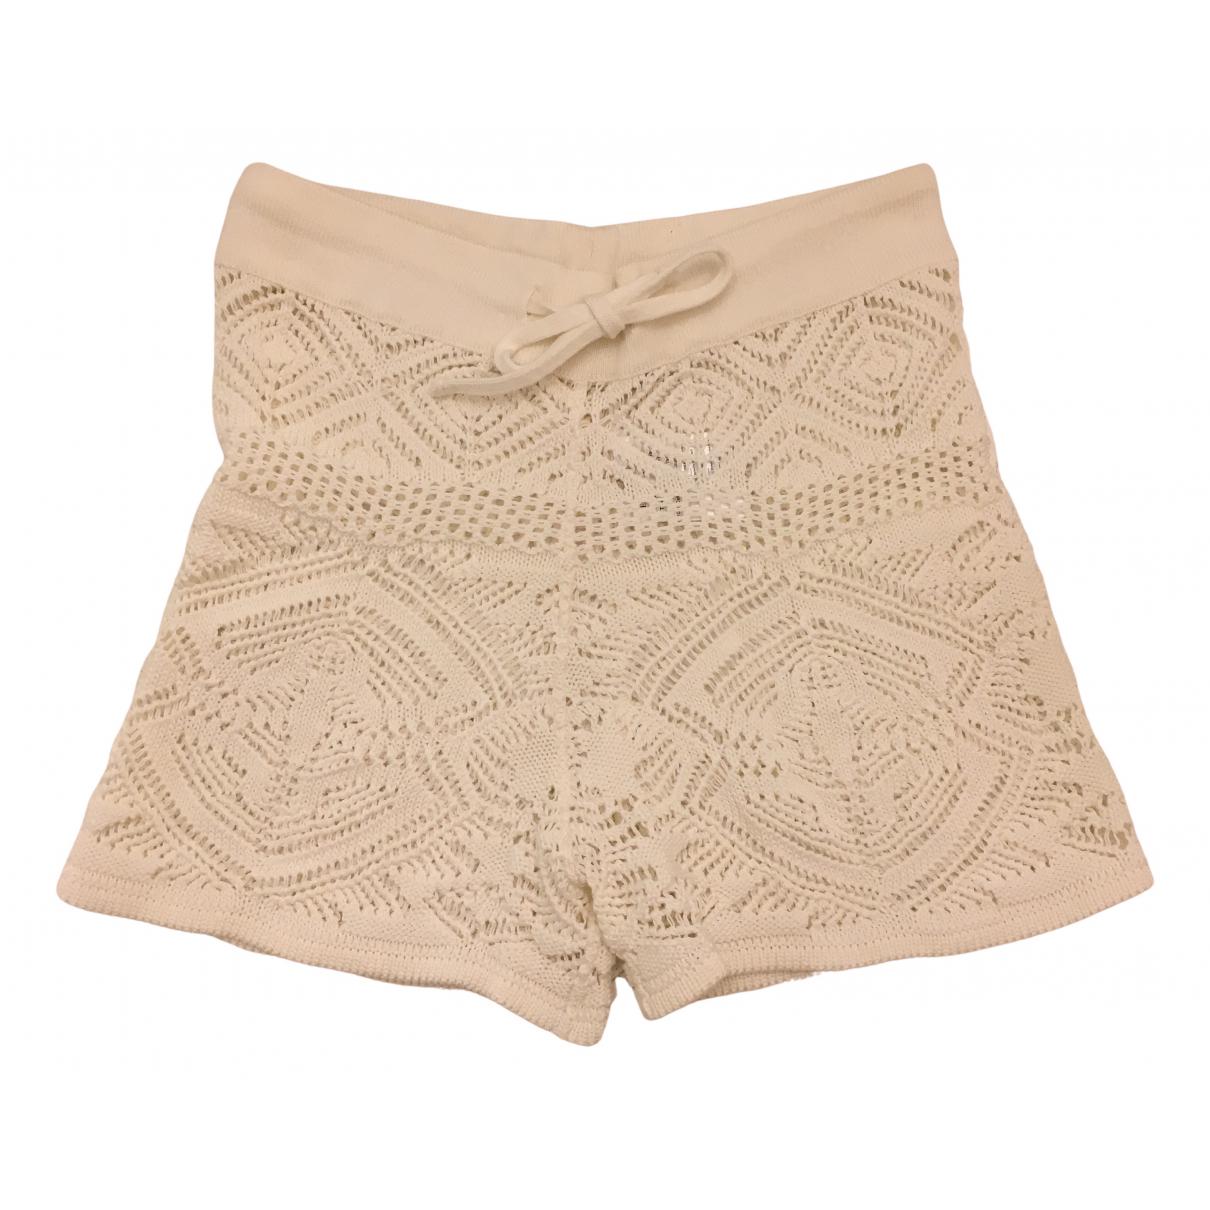 Emilio Pucci \N White Cotton Shorts for Women S International